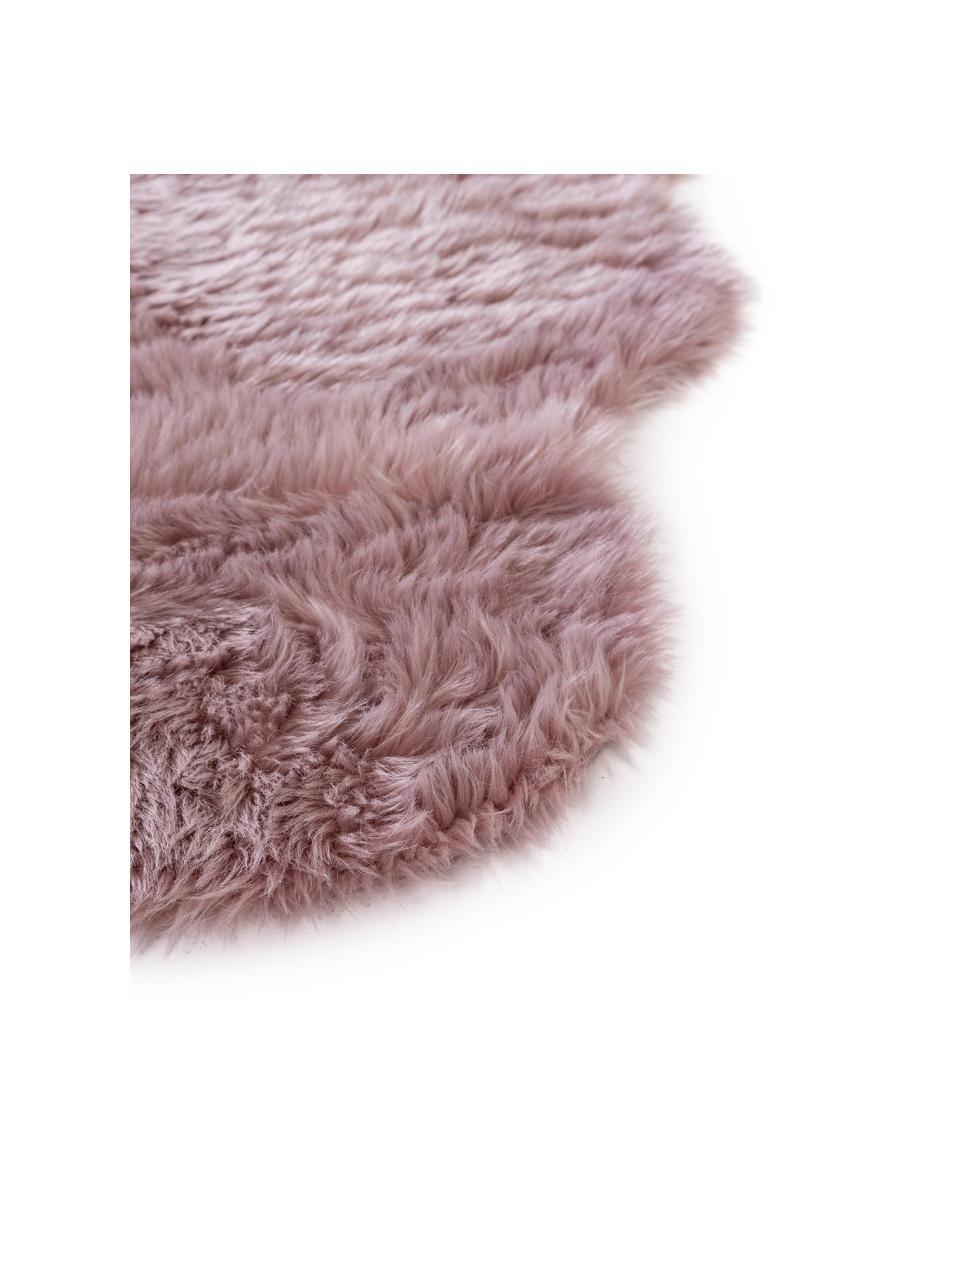 Kunstfell-Teppich Elmo, glatt, Flor: 50% Acryl, 50% Polyester, Rosa, B 140 x L 200 cm (Größe S)